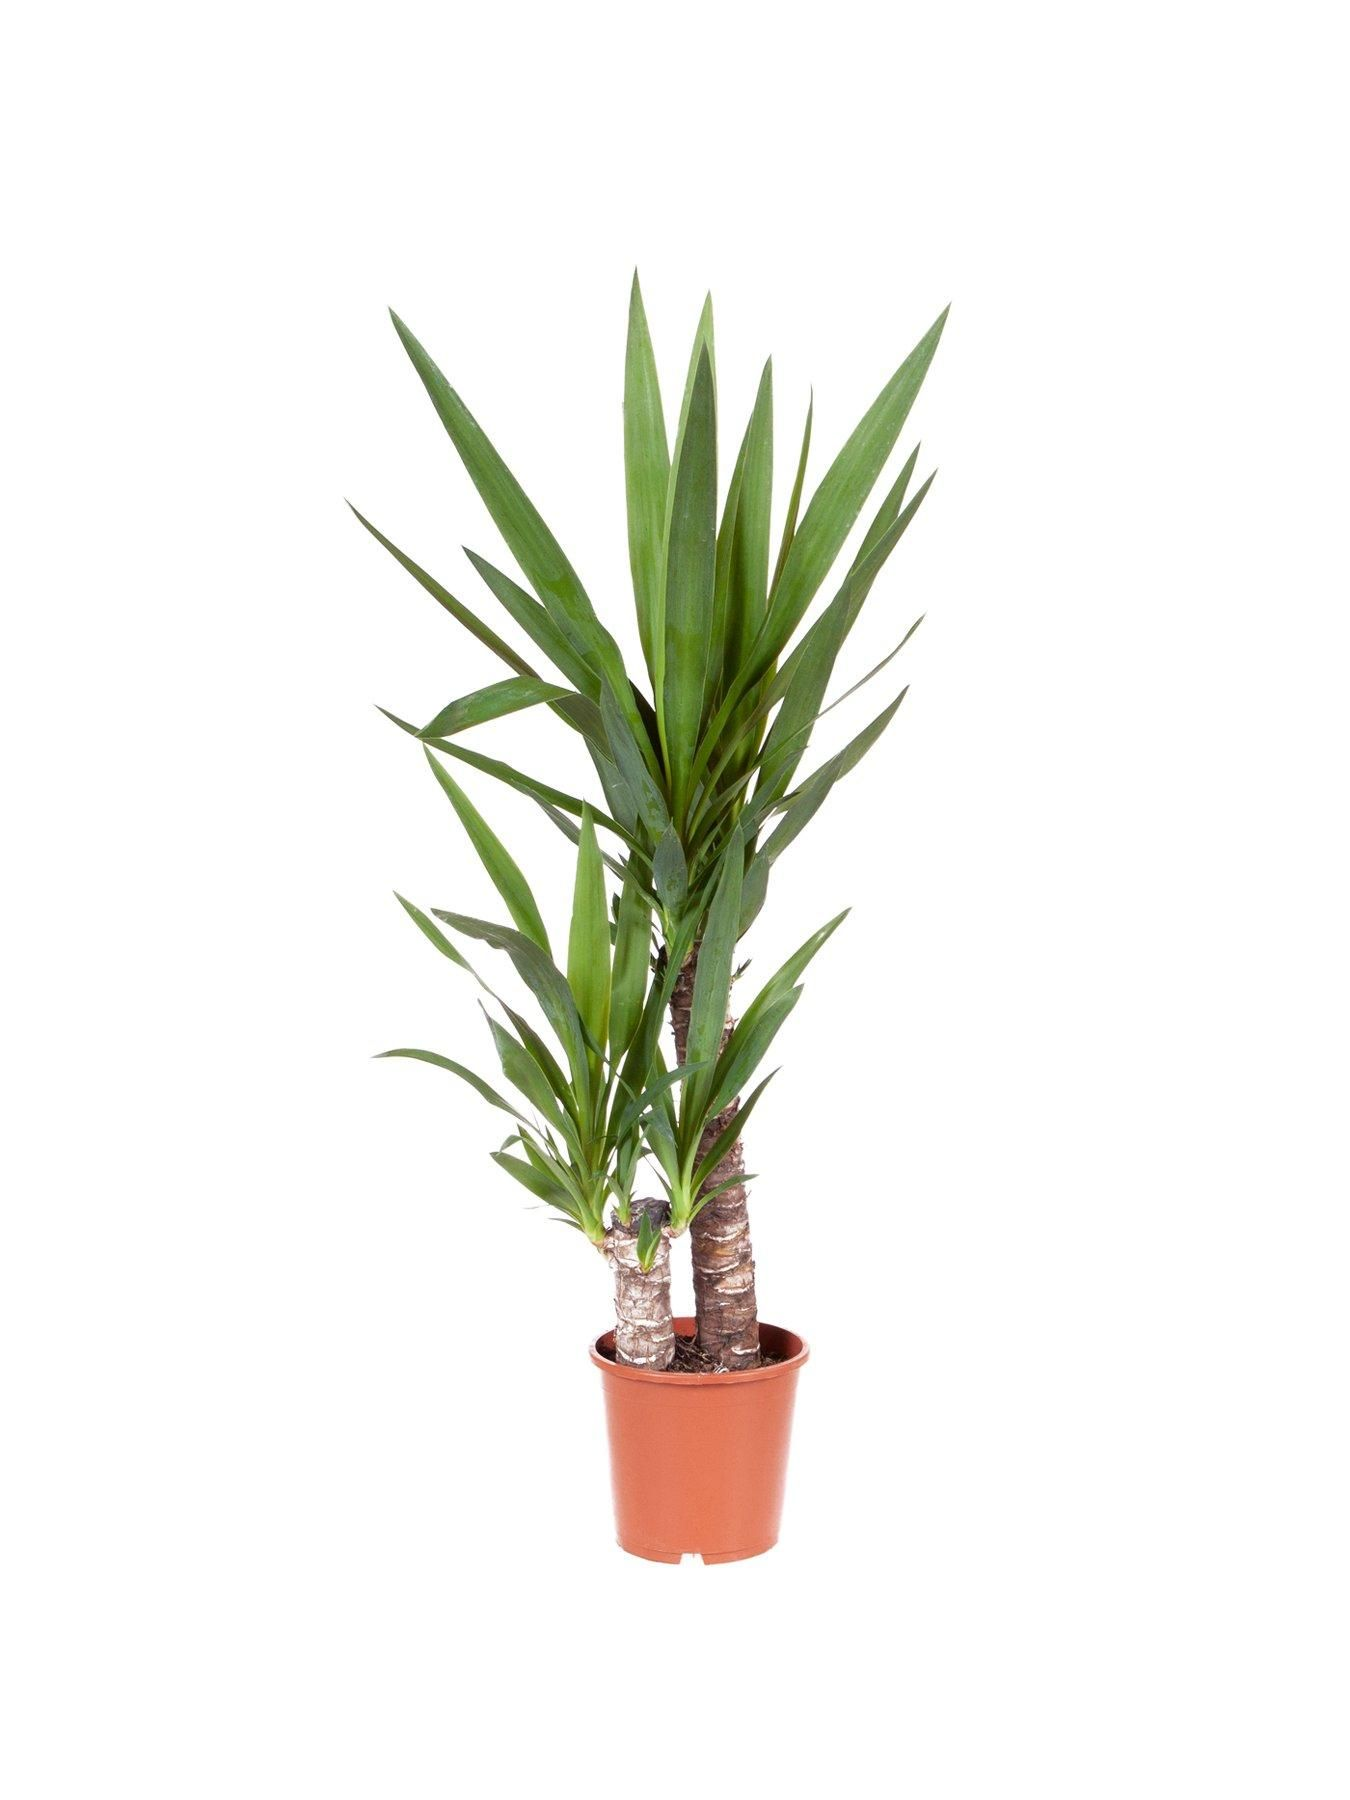 Yucca 2 stem 45/20cm in 17cm pot 80cm tall green